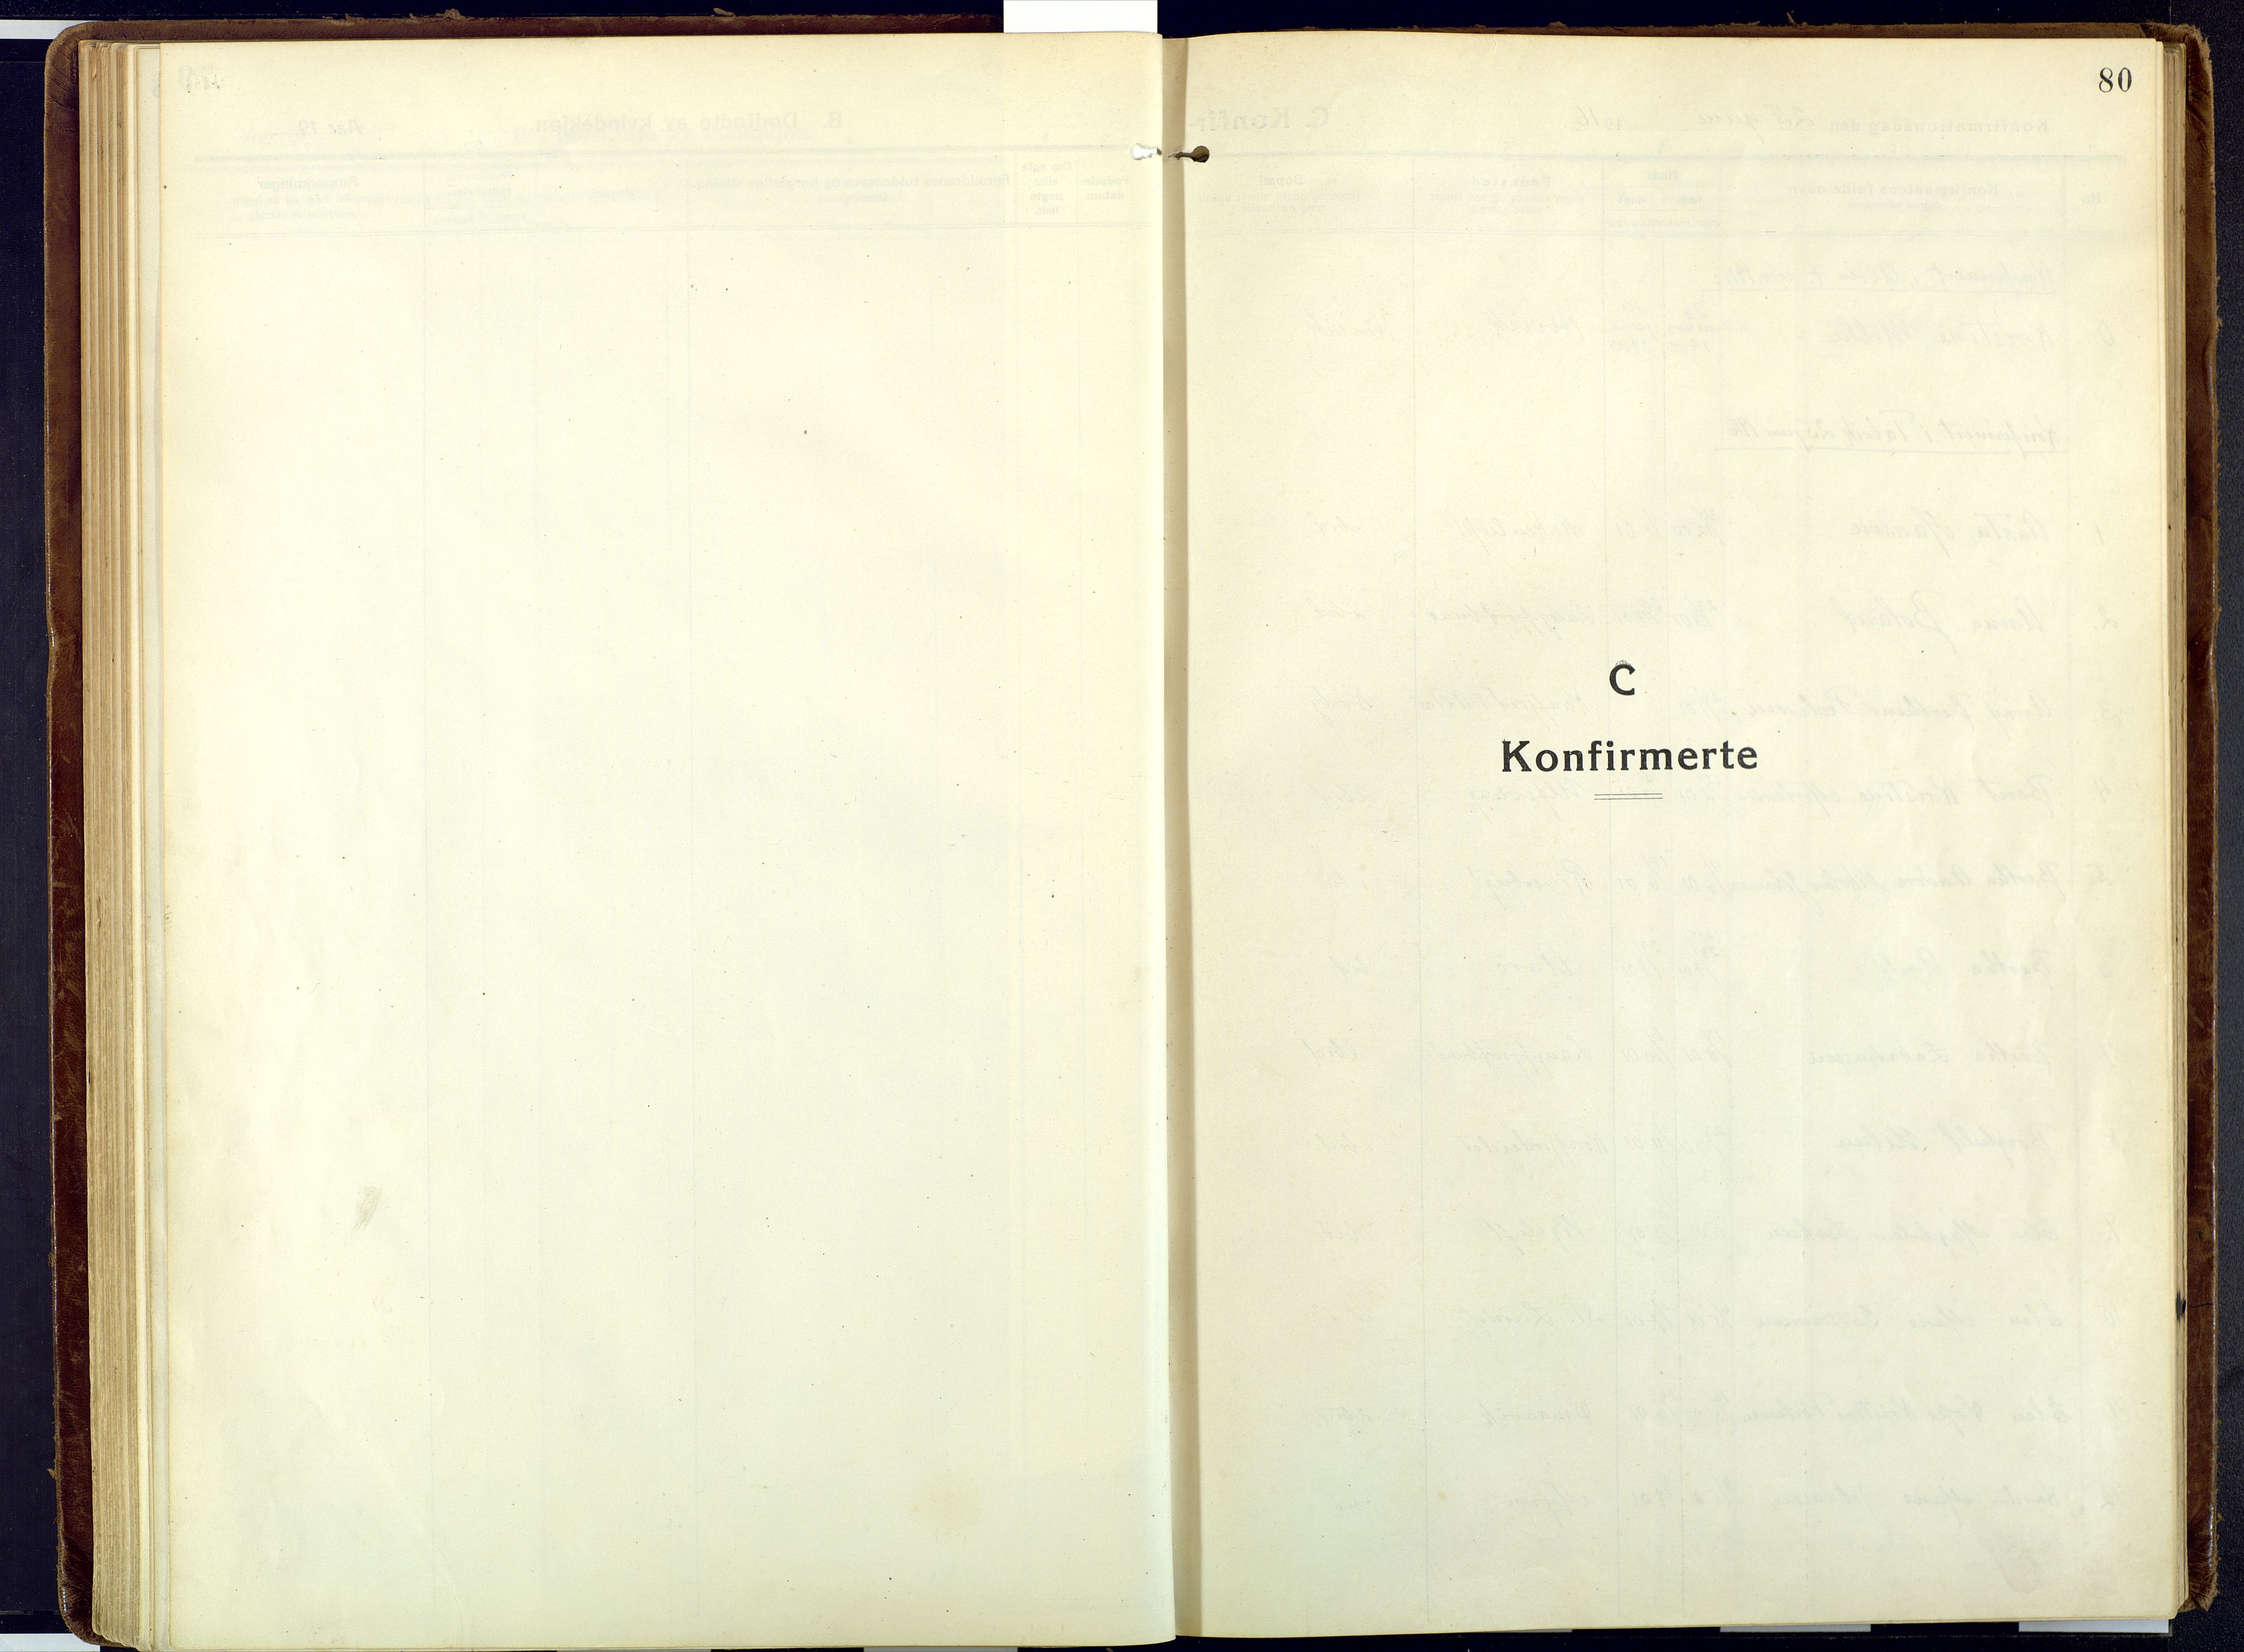 SATØ, Talvik sokneprestkontor, H/Ha/L0018kirke: Ministerialbok nr. 18, 1915-1924, s. 80